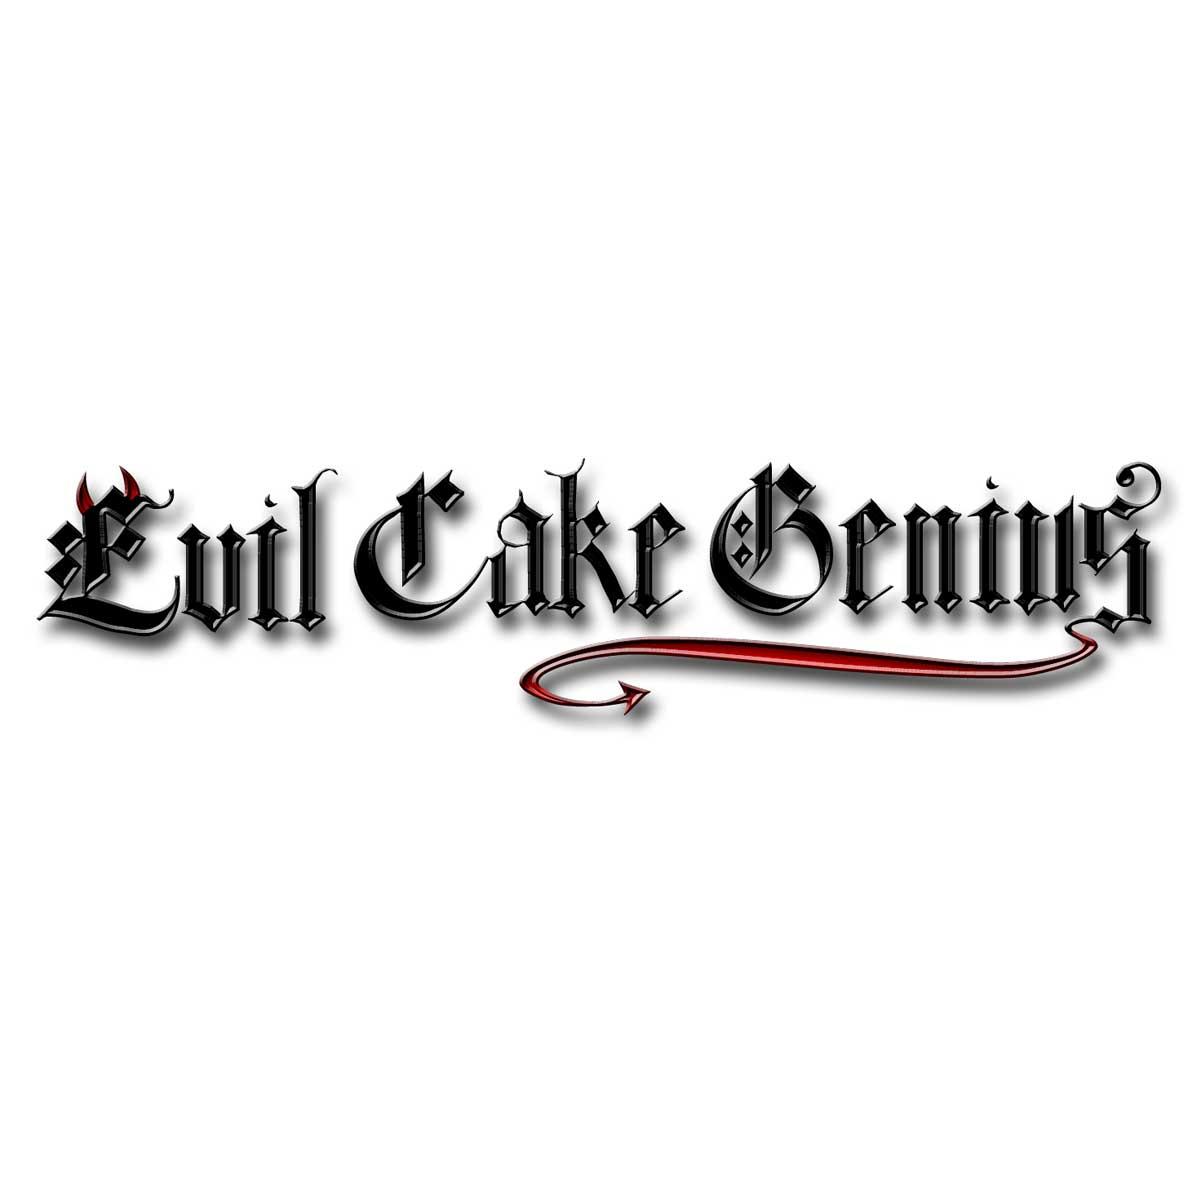 White Foil Cake Drums (Sets of 6)